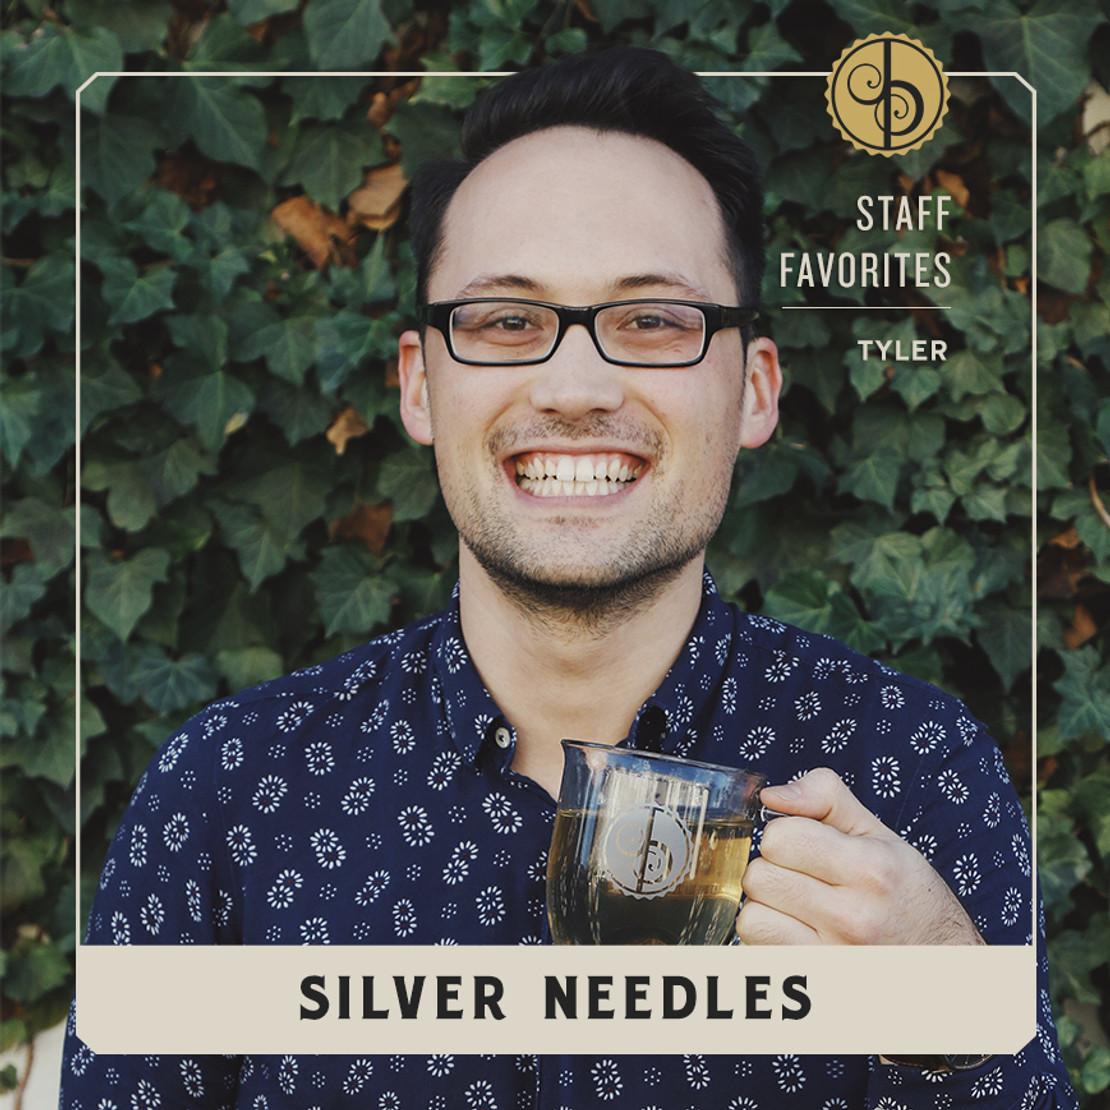 Staff Favorites: Tyler & Silver Needles